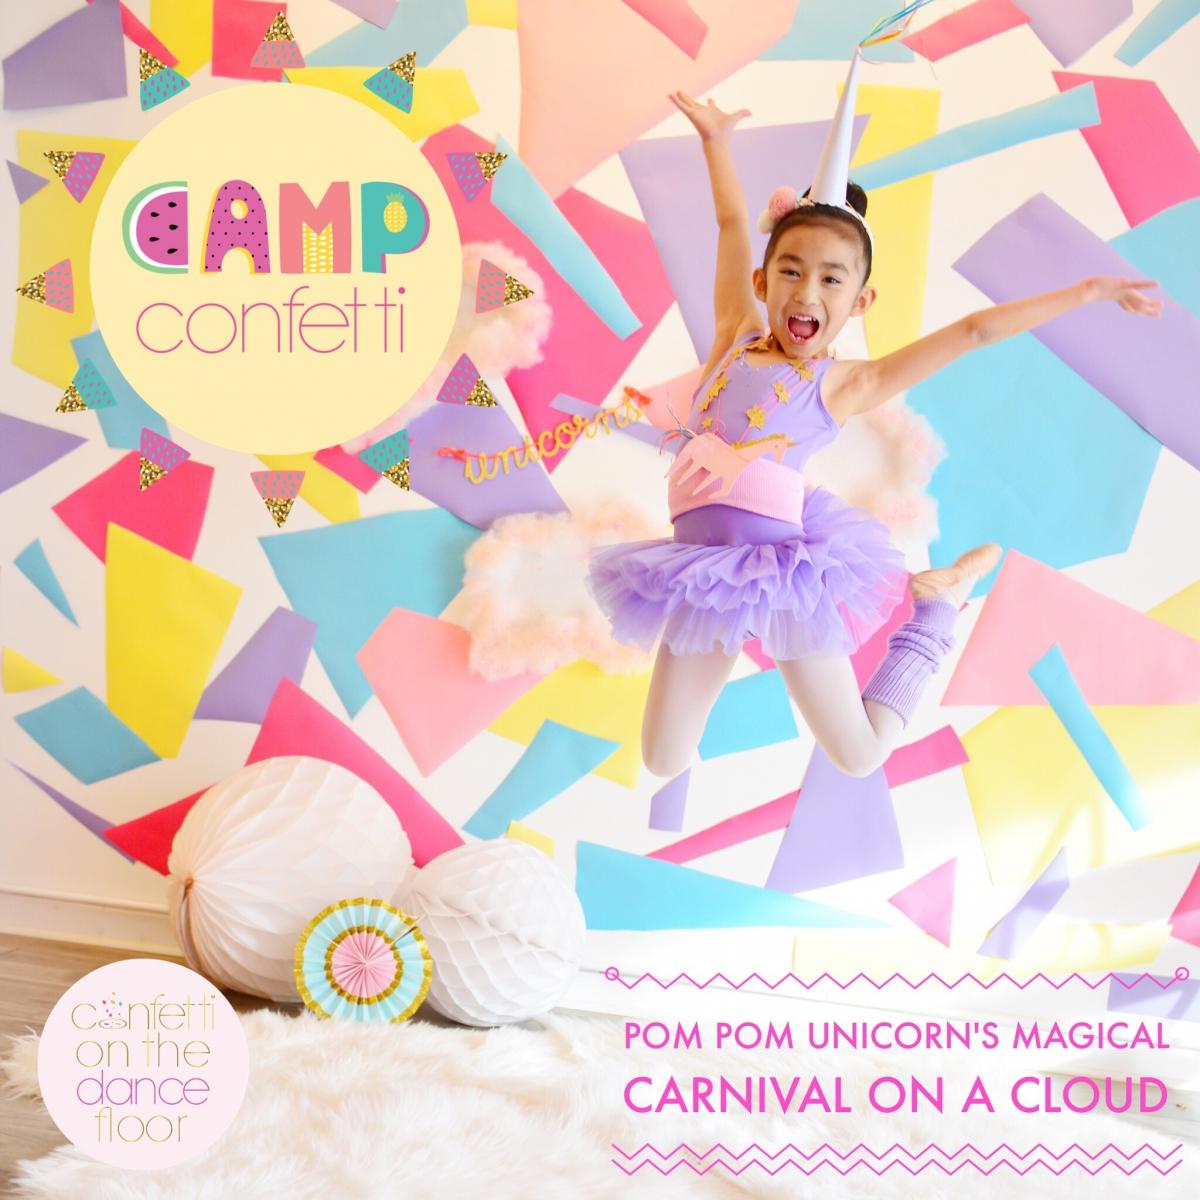 Pom Pom Unicorns Magical Carnival on a Cloud.jpg